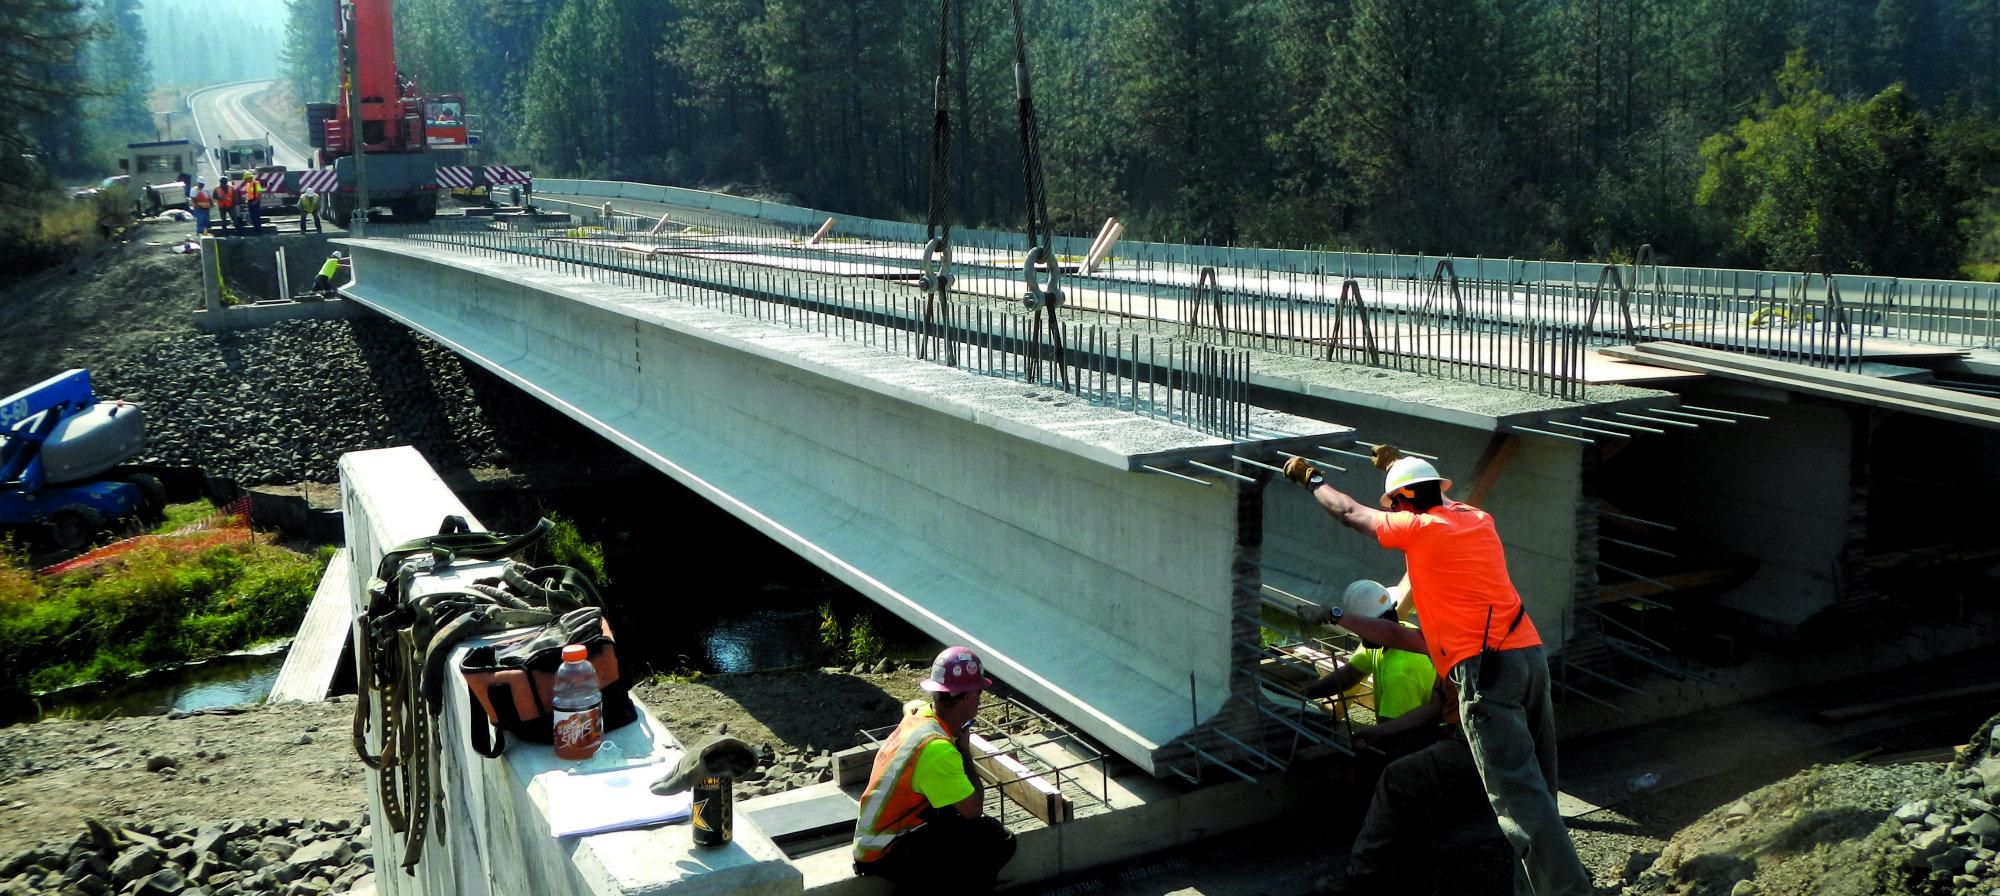 136 Foot Super Girder Used On Bridge Project Concrete